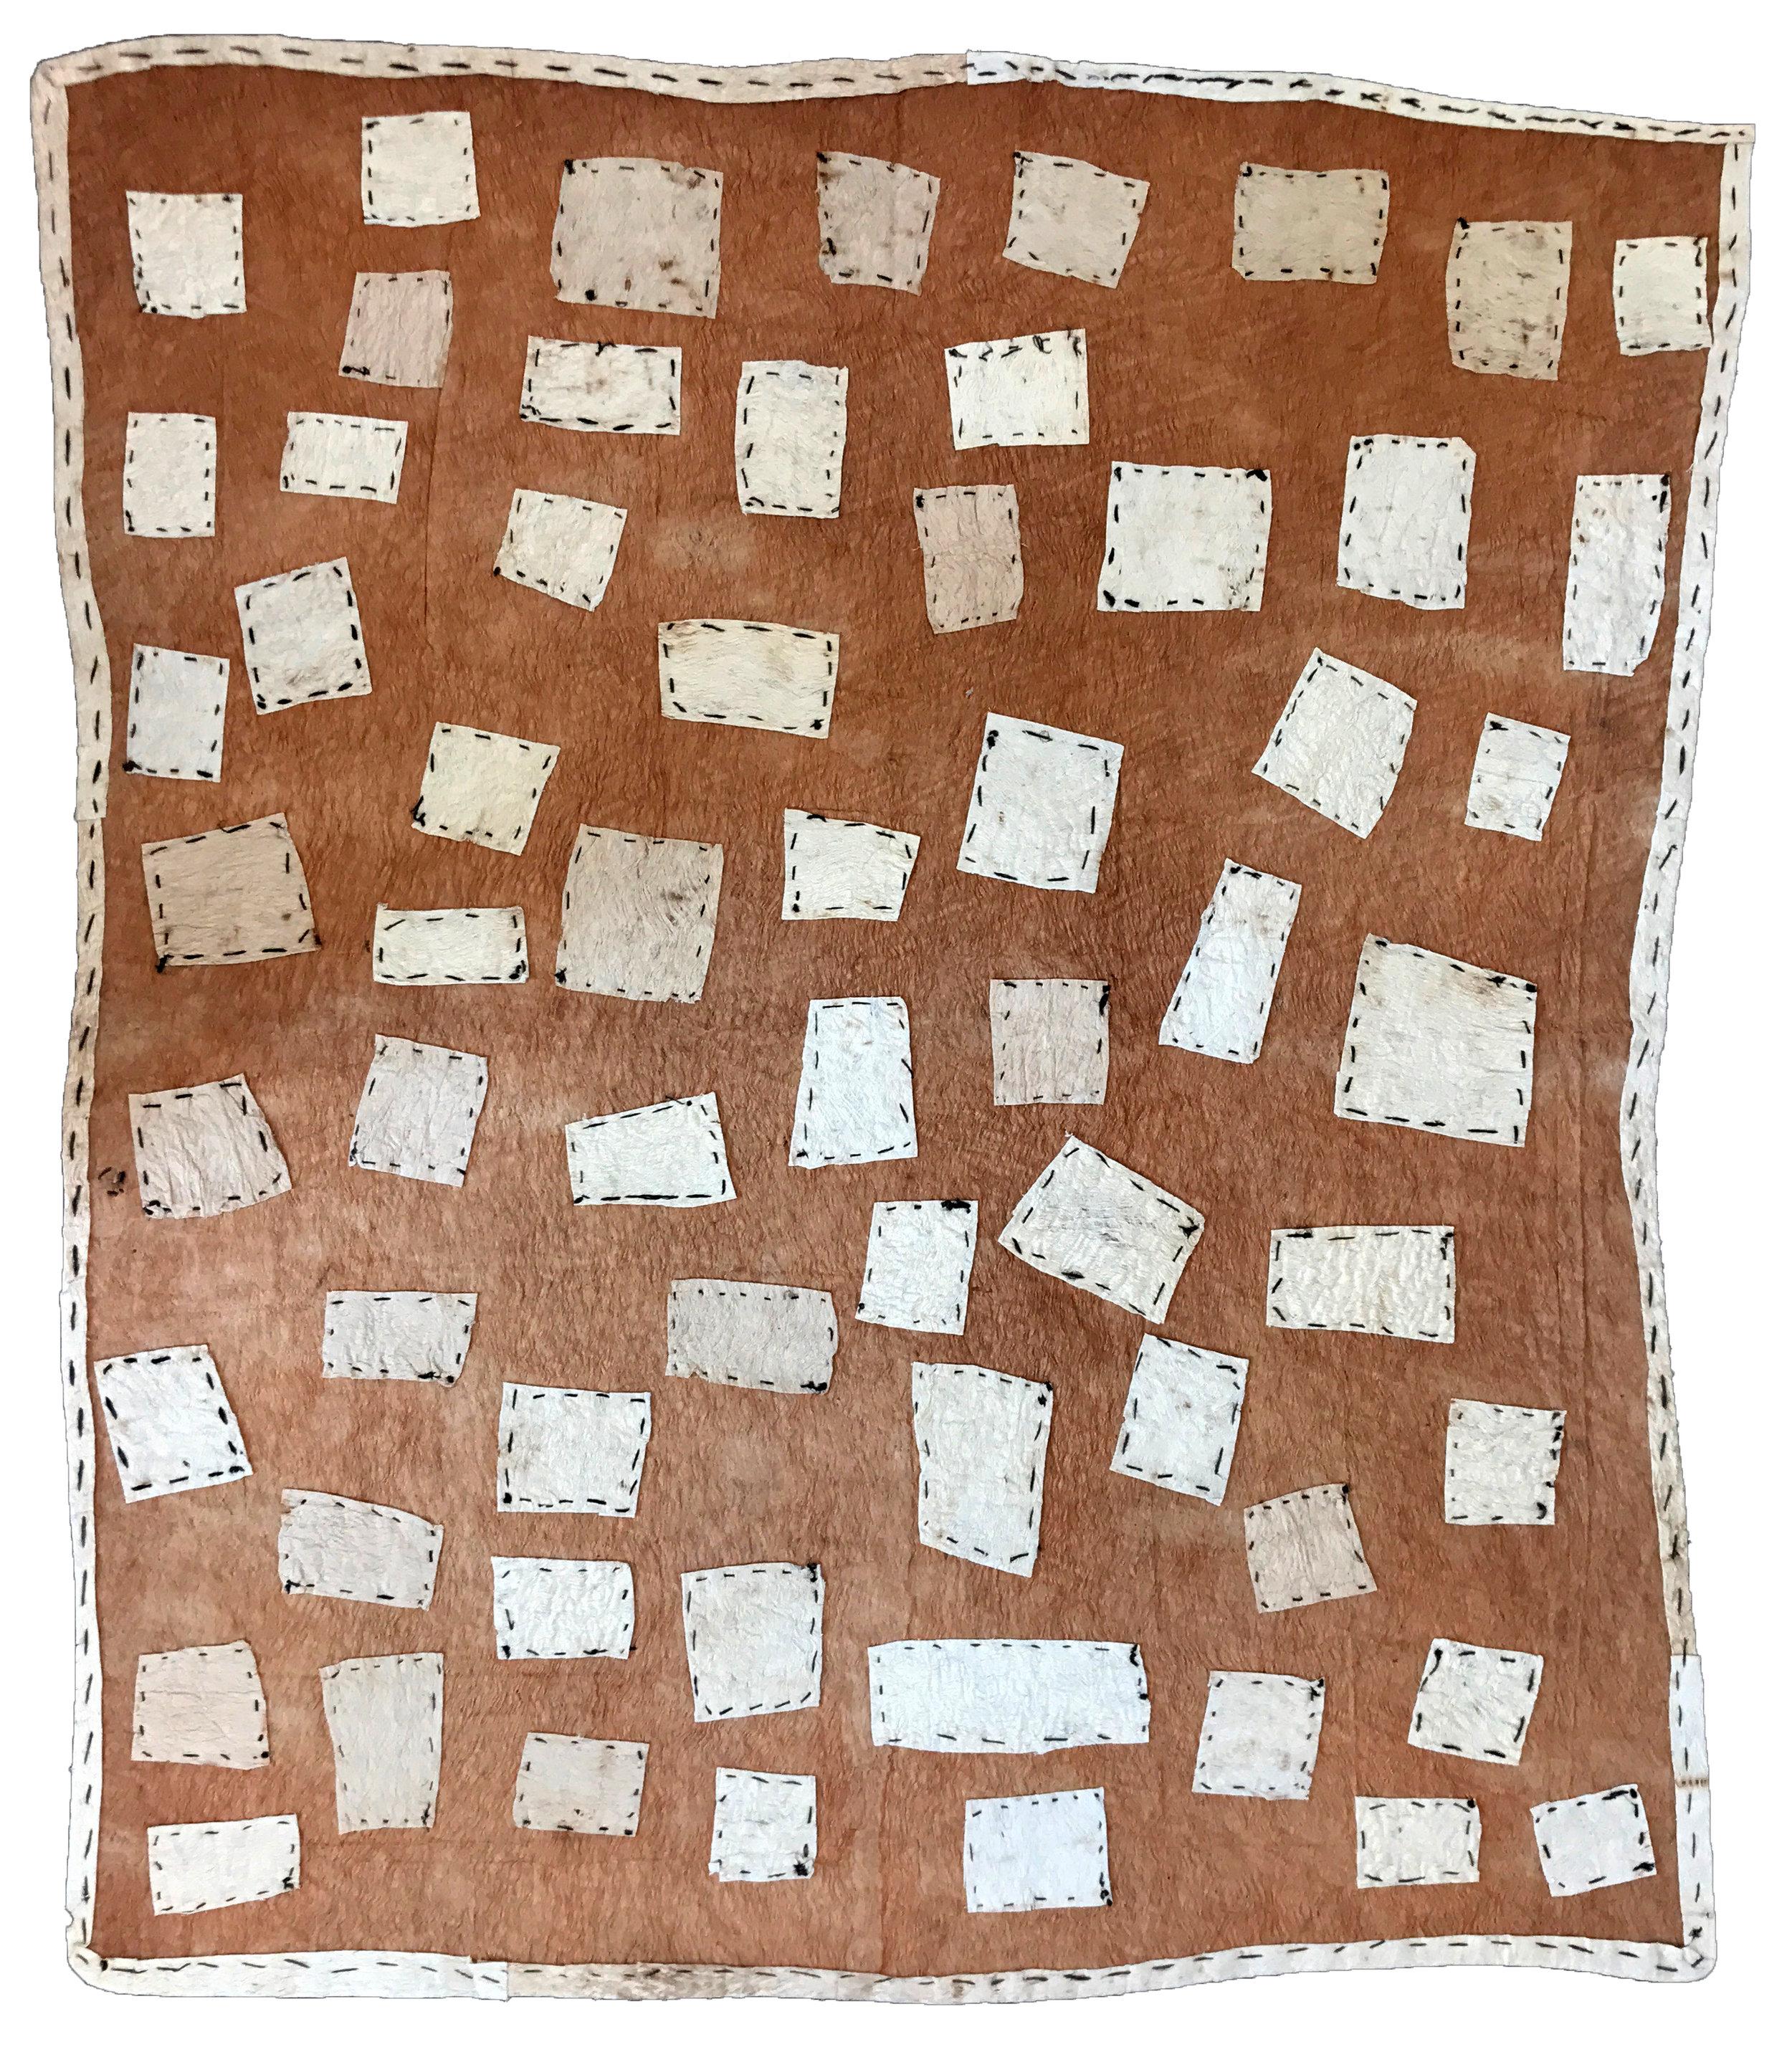 Brenda Kesi (Ariré)    Taliobamë'e nioge   Ancestral design of the mud  84.5 x 96.5cm  Appliqued mud-dyed nioge (barkcloth), 2016